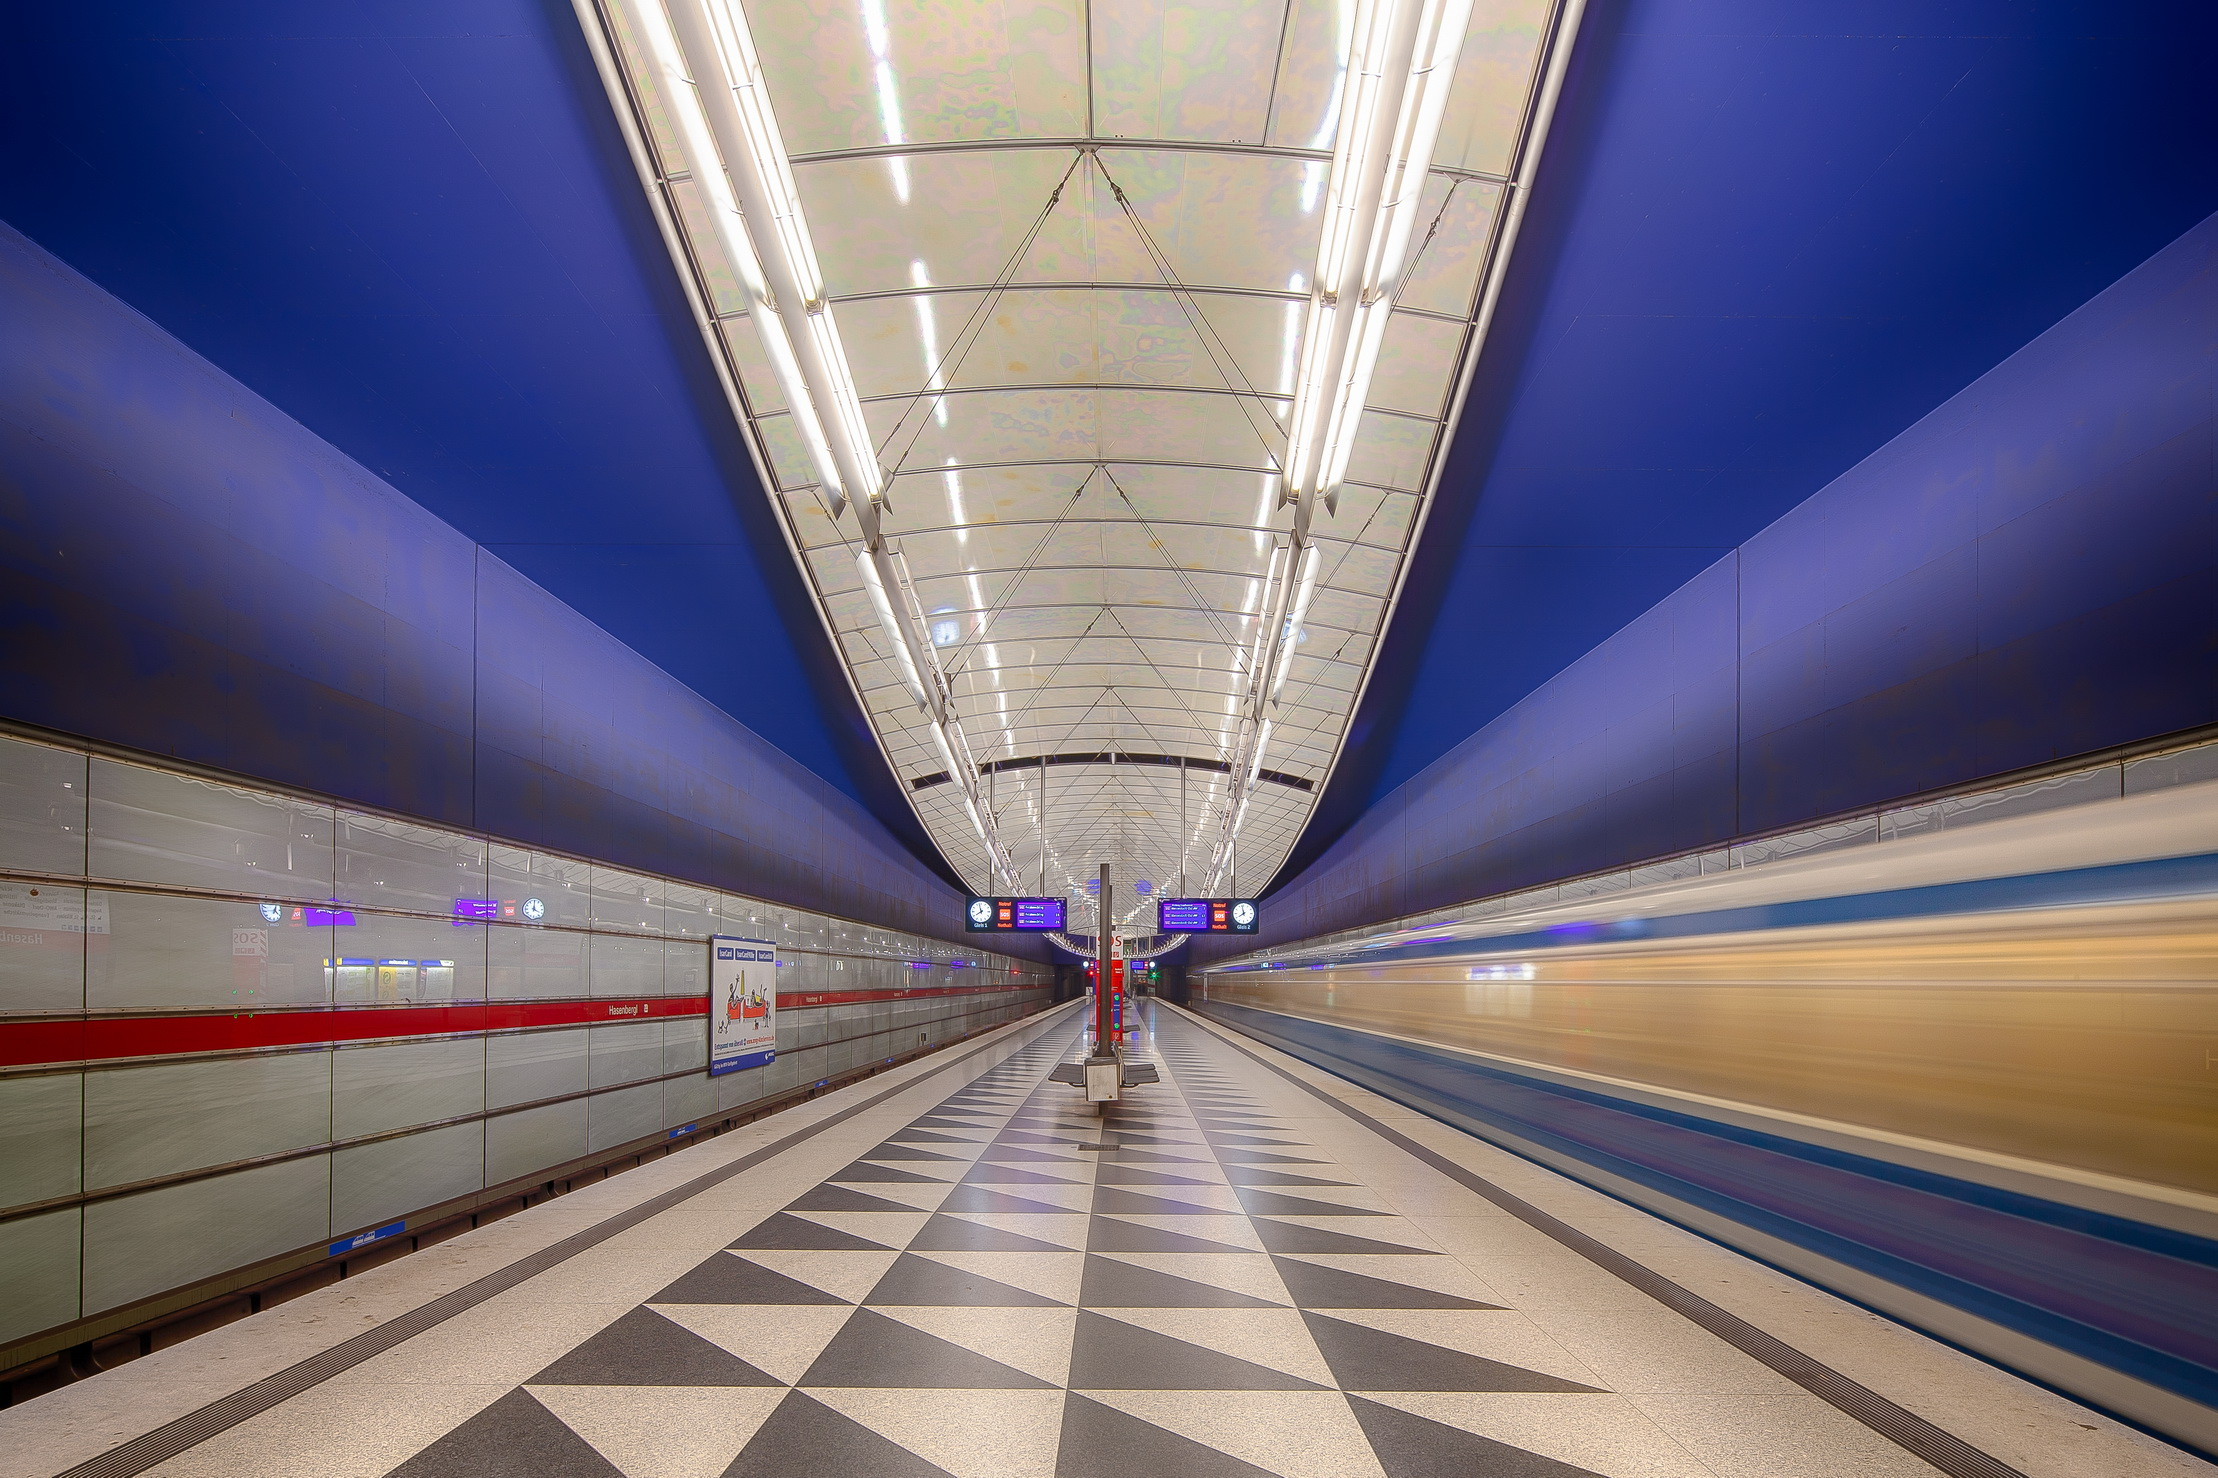 Ubahnhof München